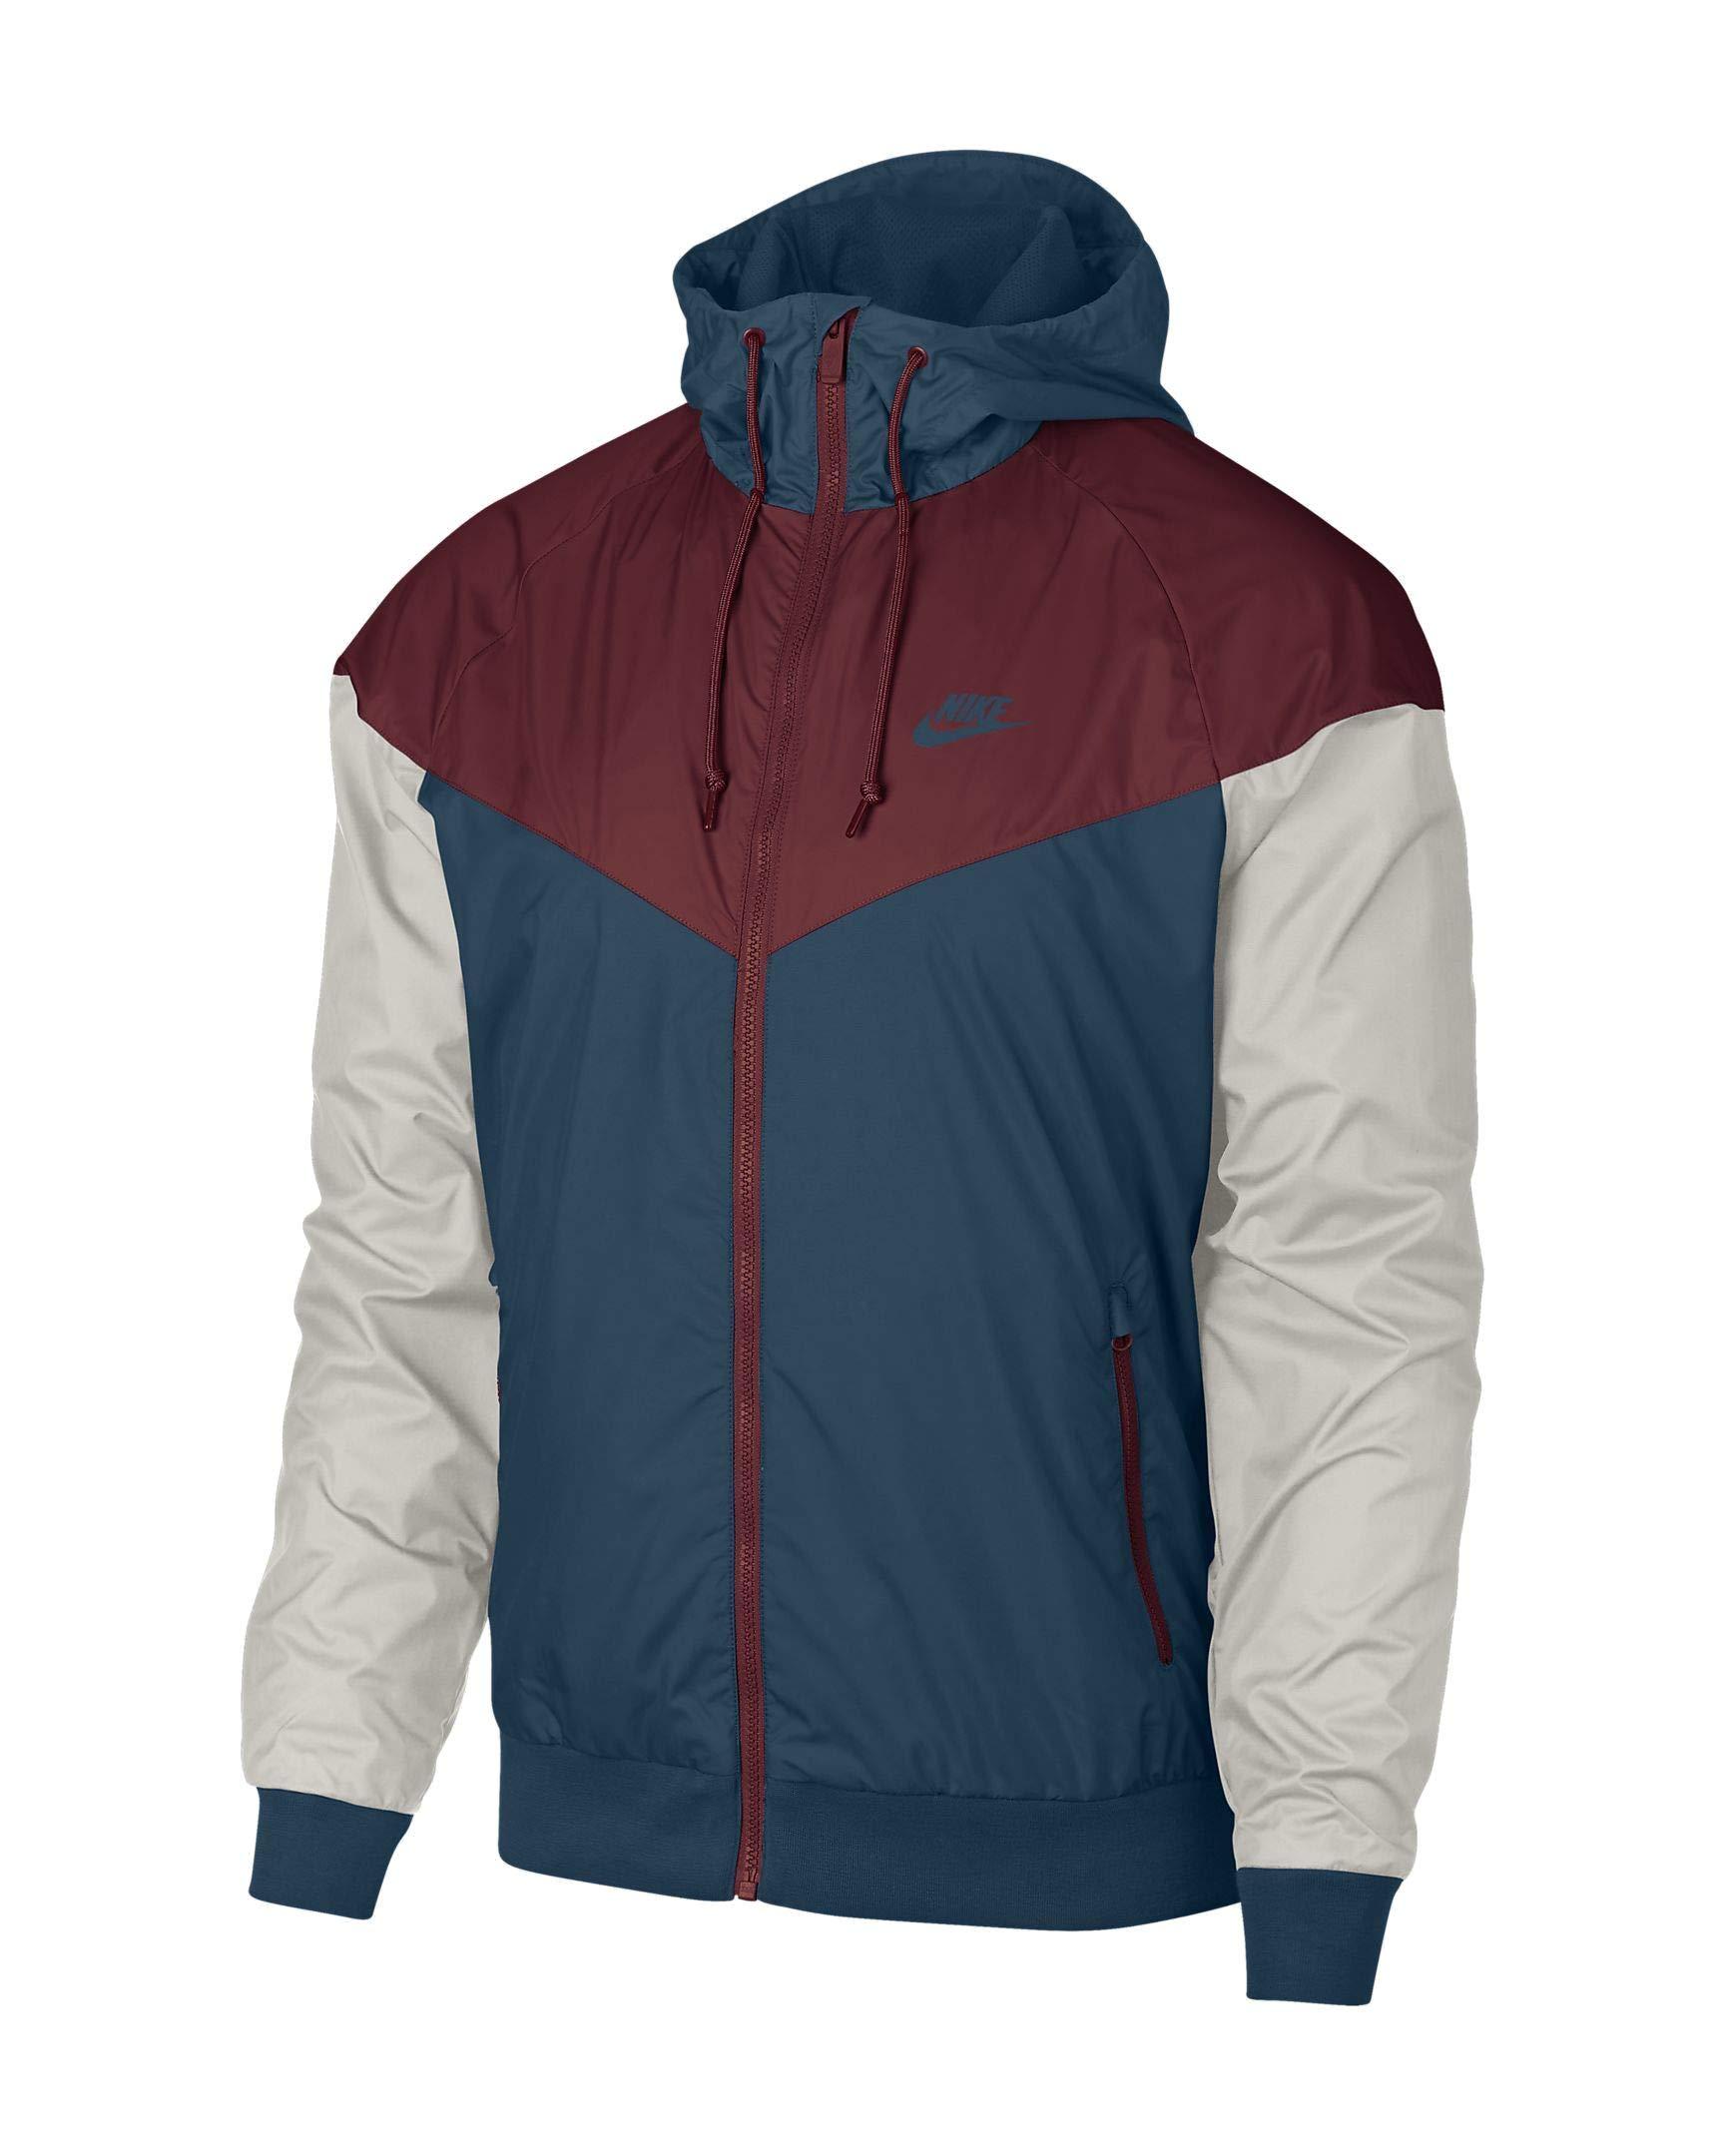 45bca0484 Galleon - Nike Sportswear Windrunner Jacket (Blue Force/Team Red/Light  Bone, M)